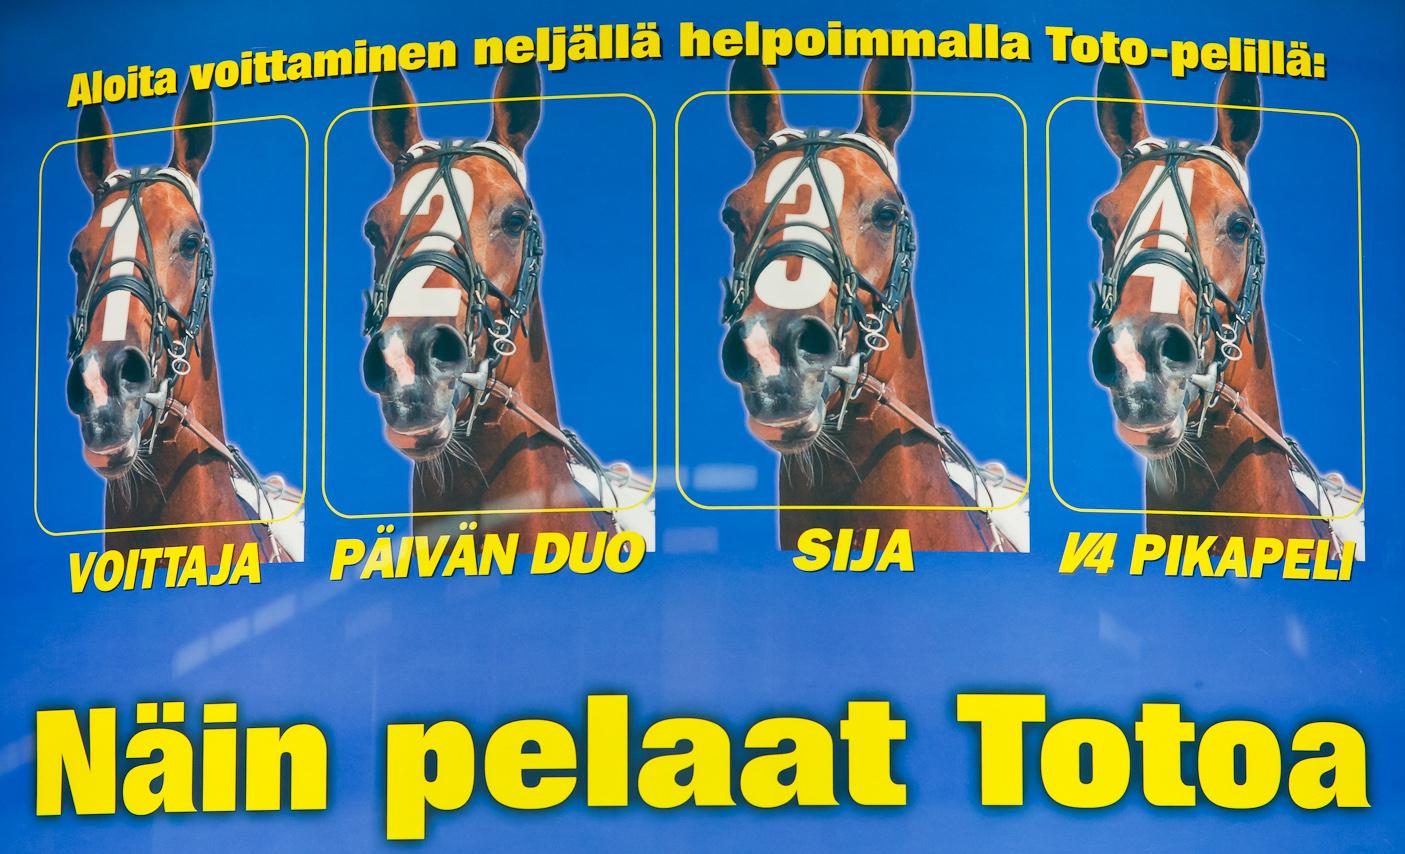 TOTO, photo 167015, 2011-01-09